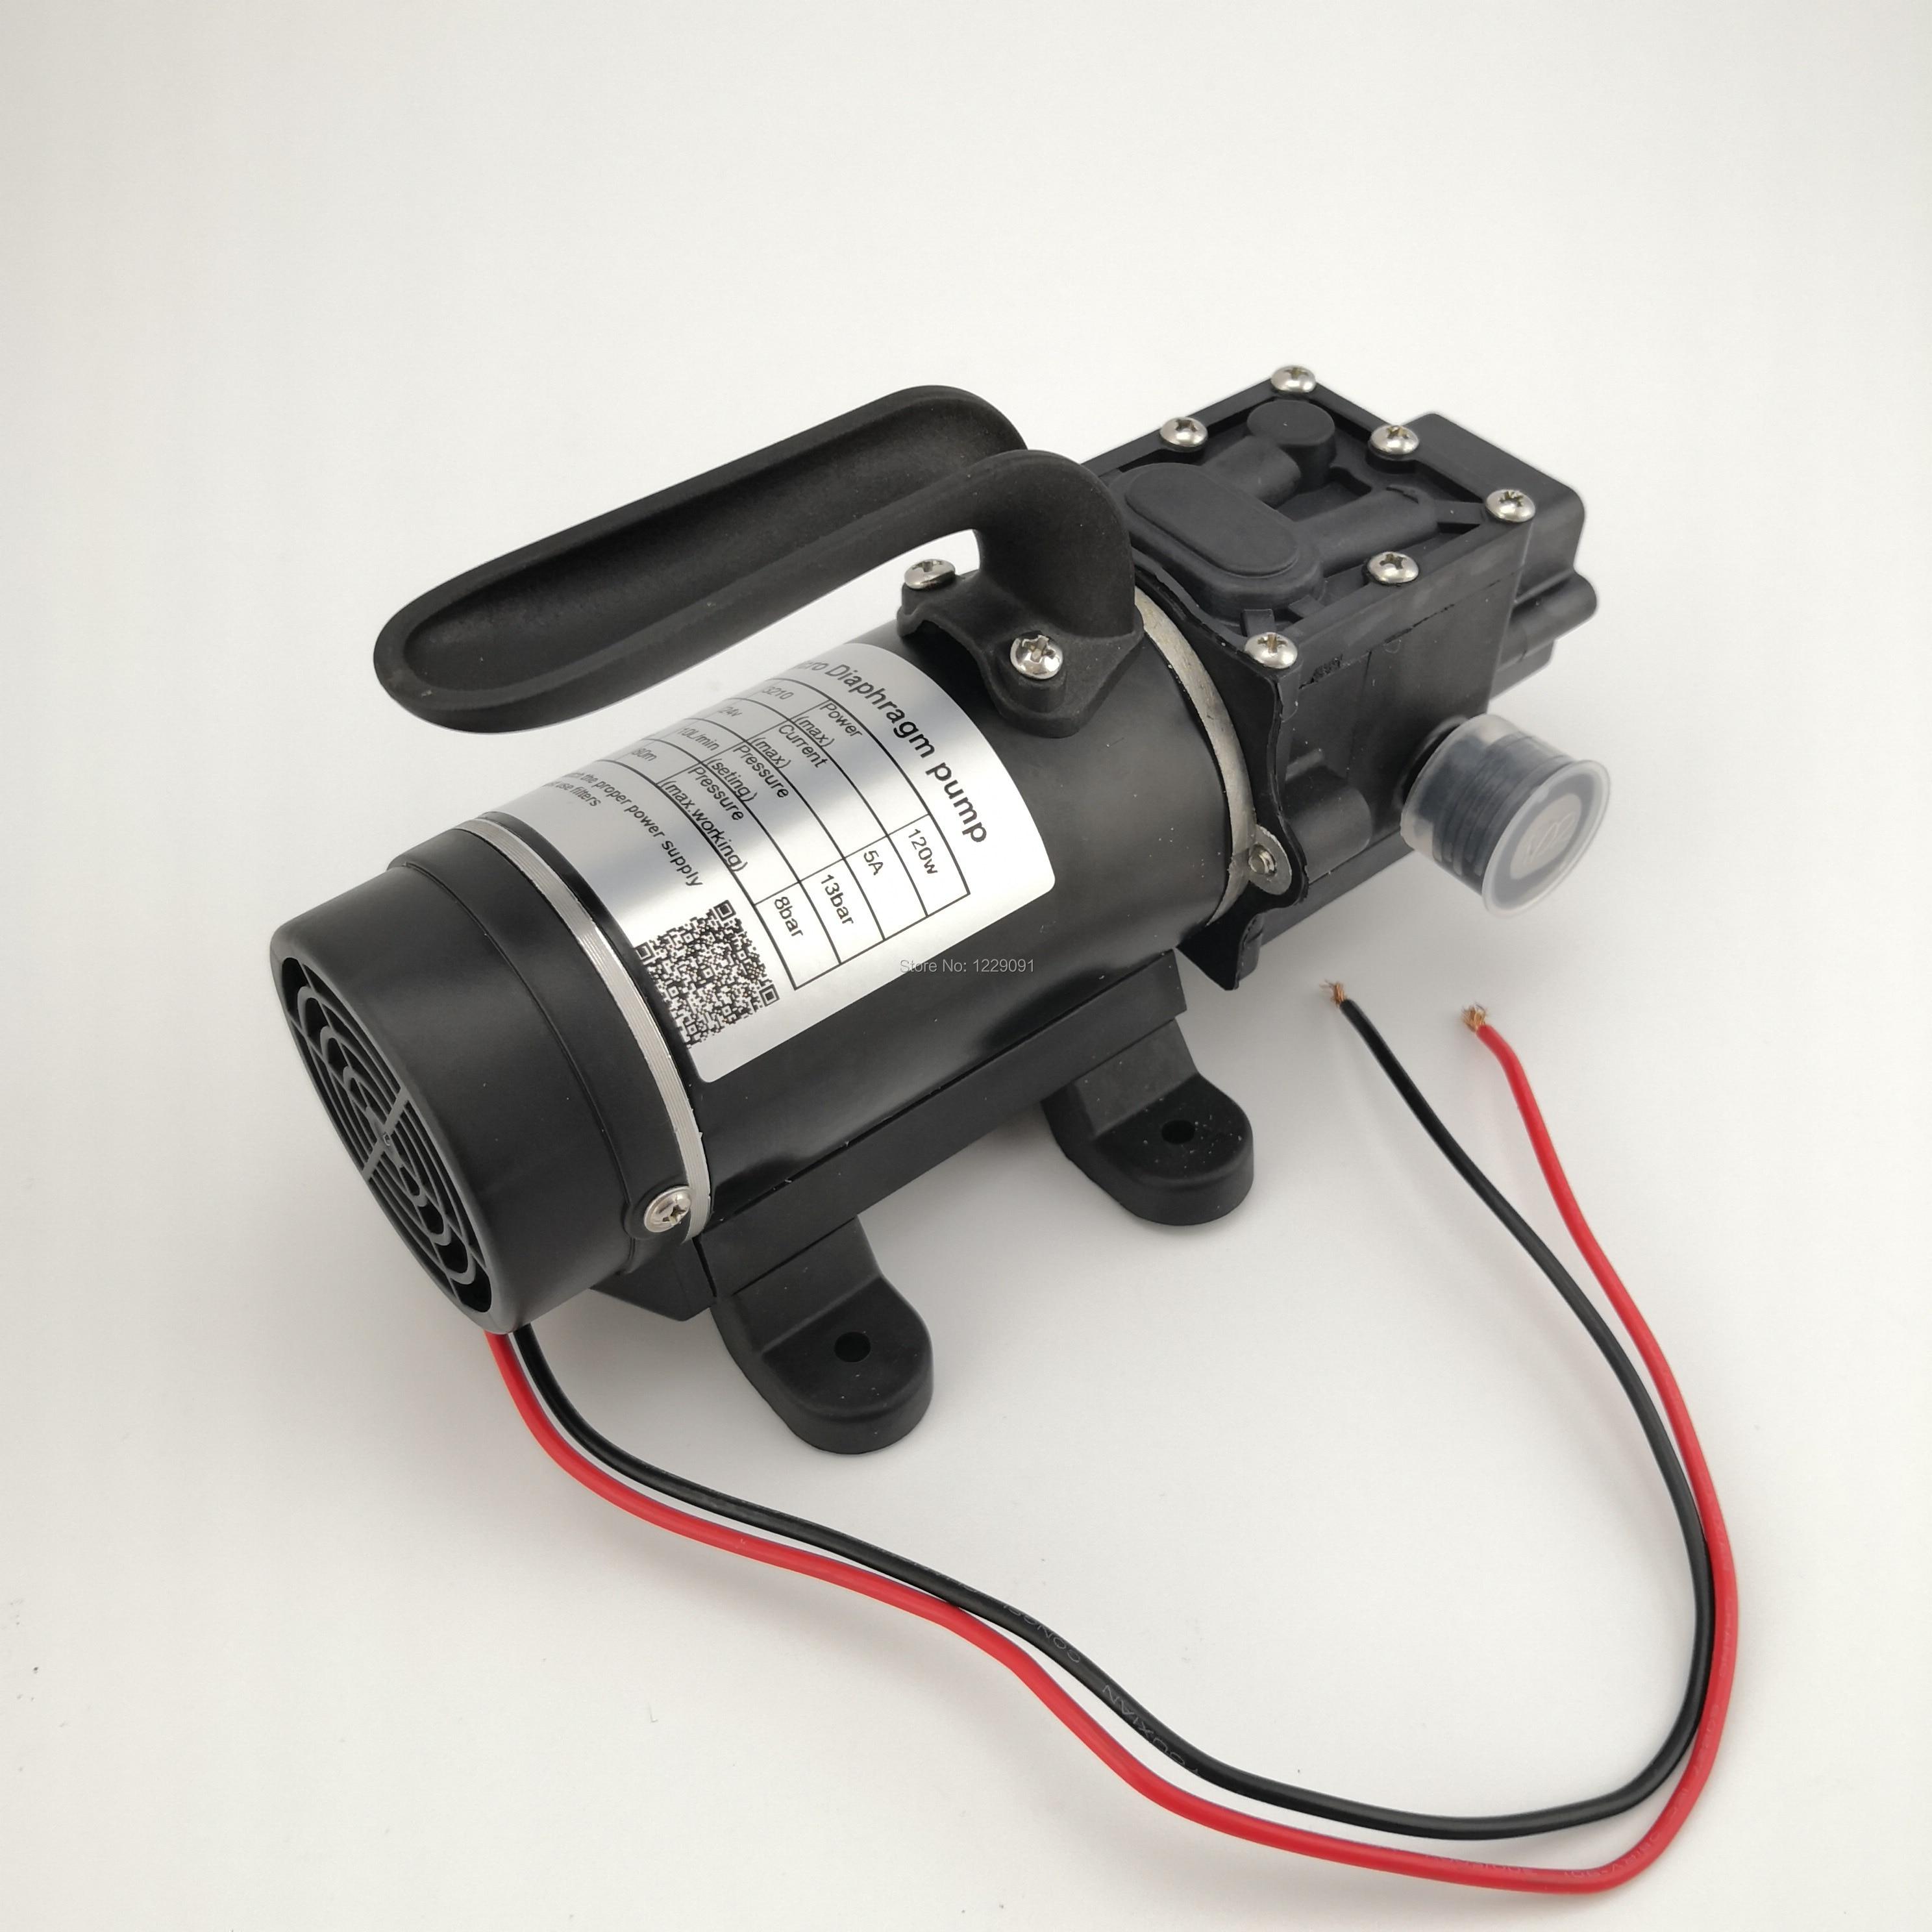 10L/min 120W electric high pressure self priming small dc Water Pump Diaphragm pump 12v 24v kamoer kvp04 12v 24v mini diaphragm vaccum pump electric air pump with low flow rate 1 1l min and low noise